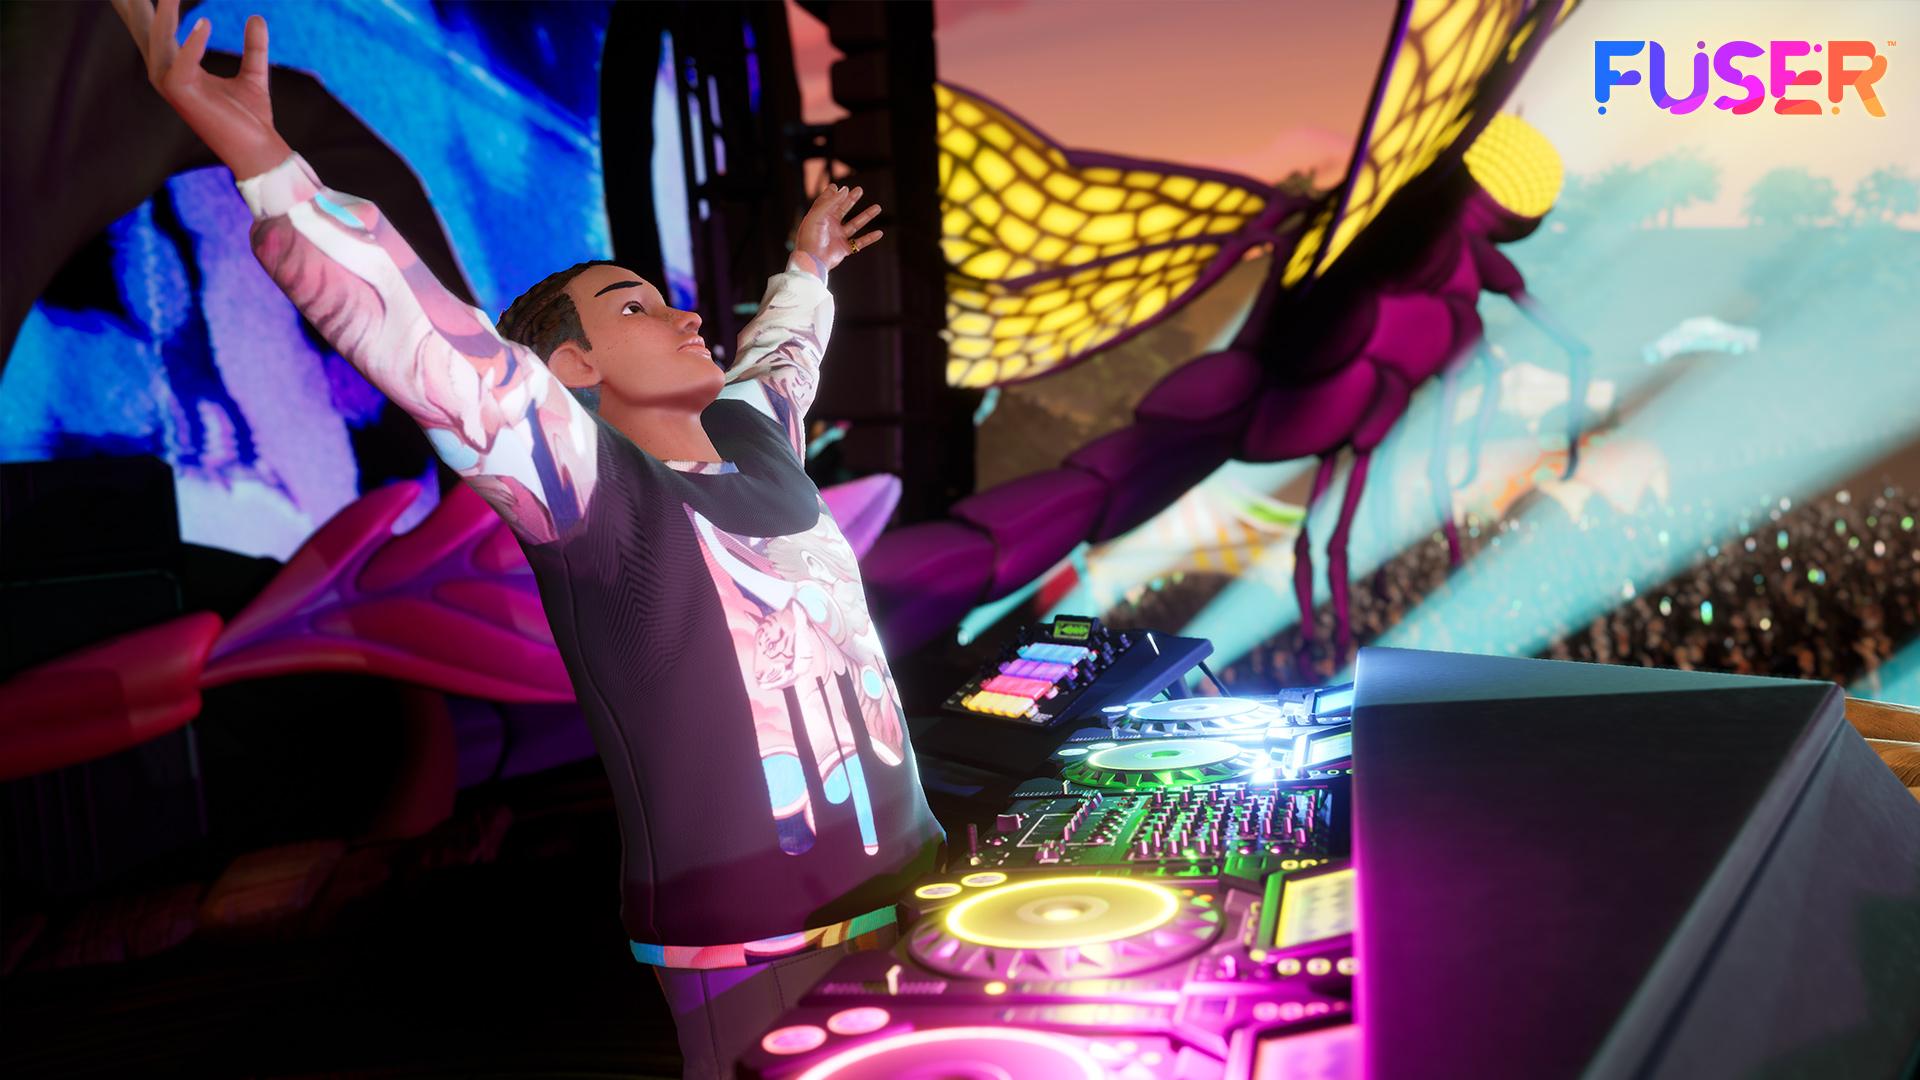 FUSER Community: Masters of Mix, February 12